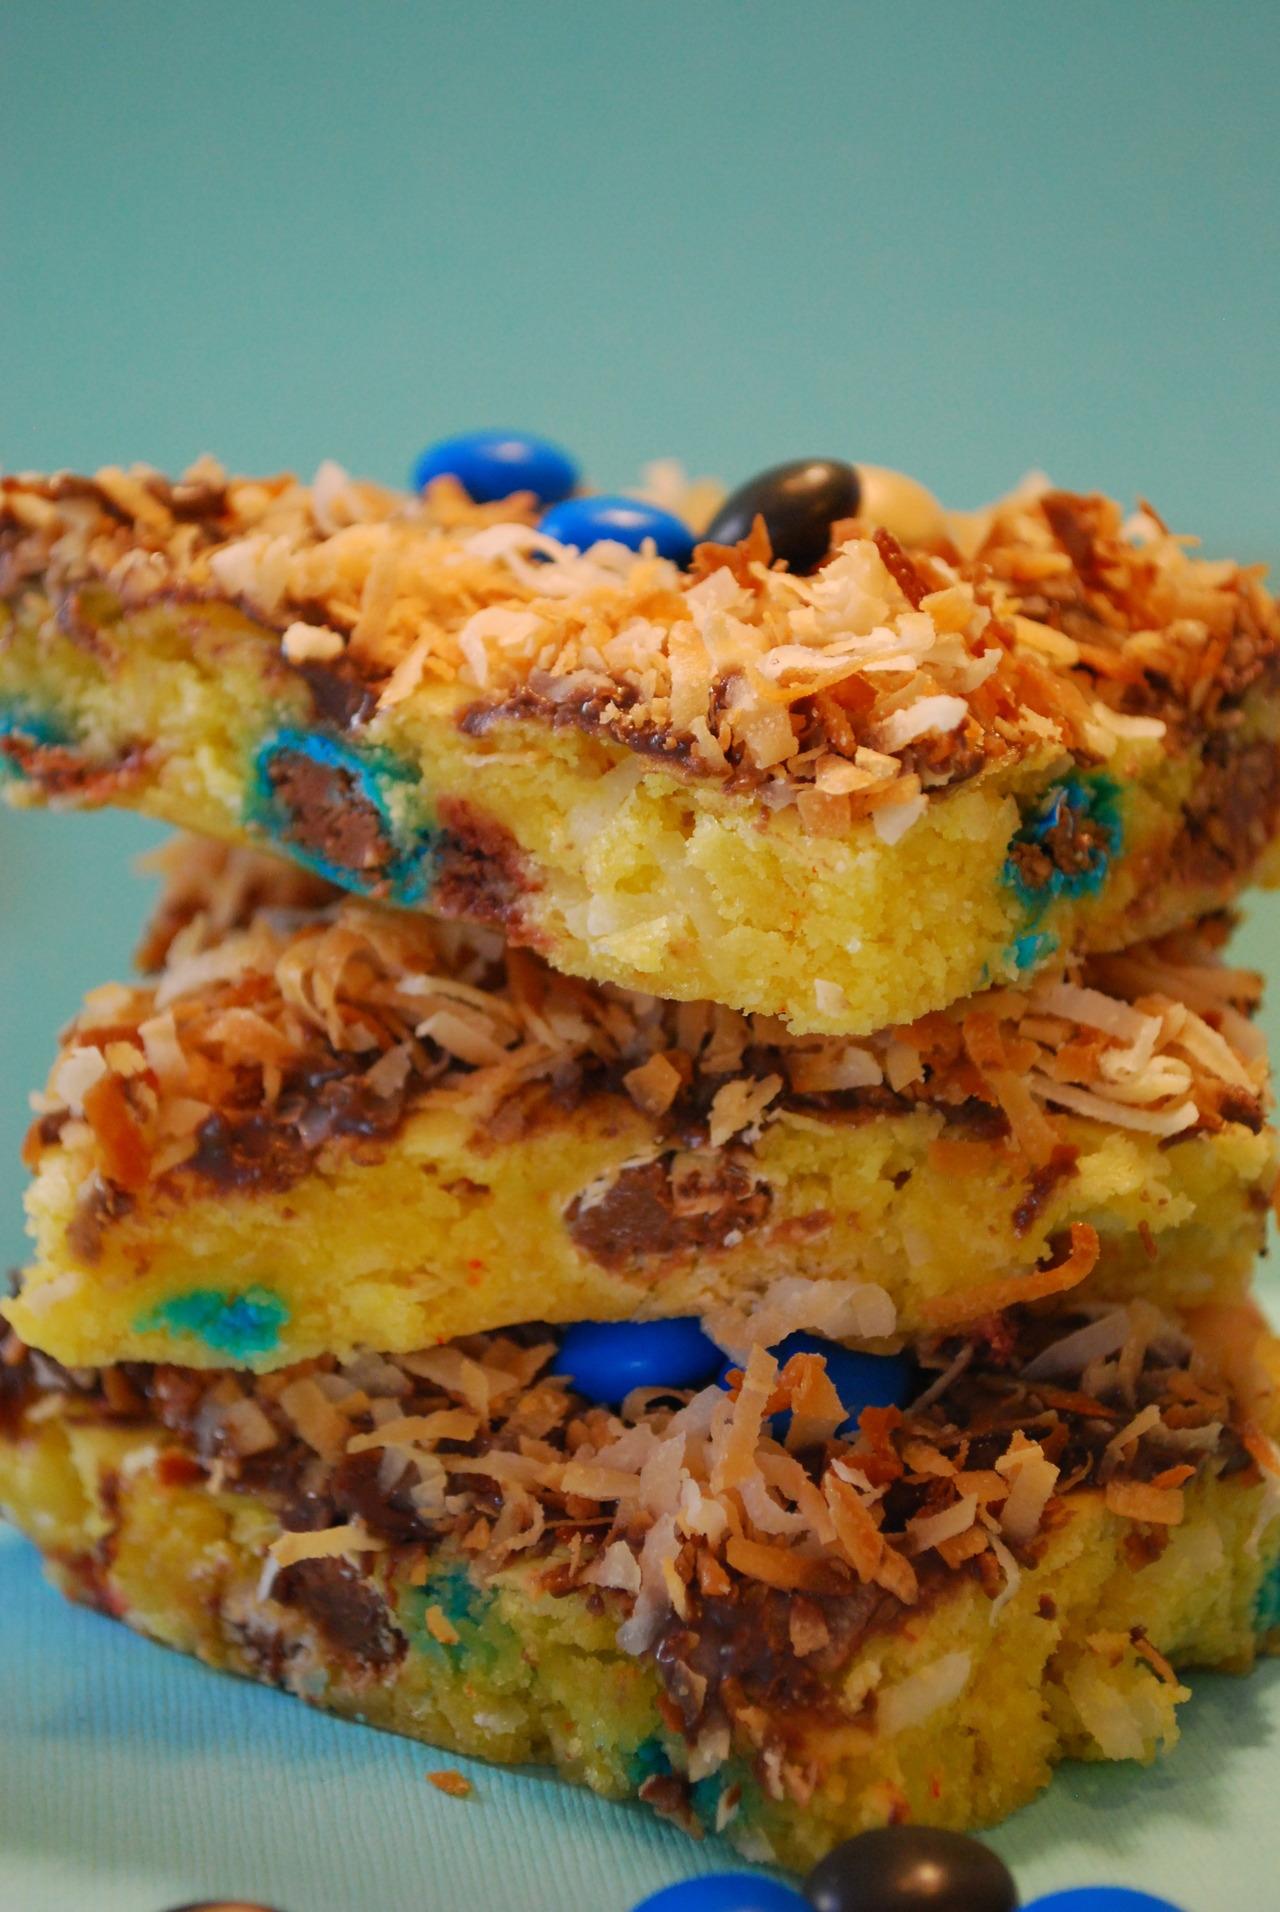 Recipe: Almond Joy Blondie Bars